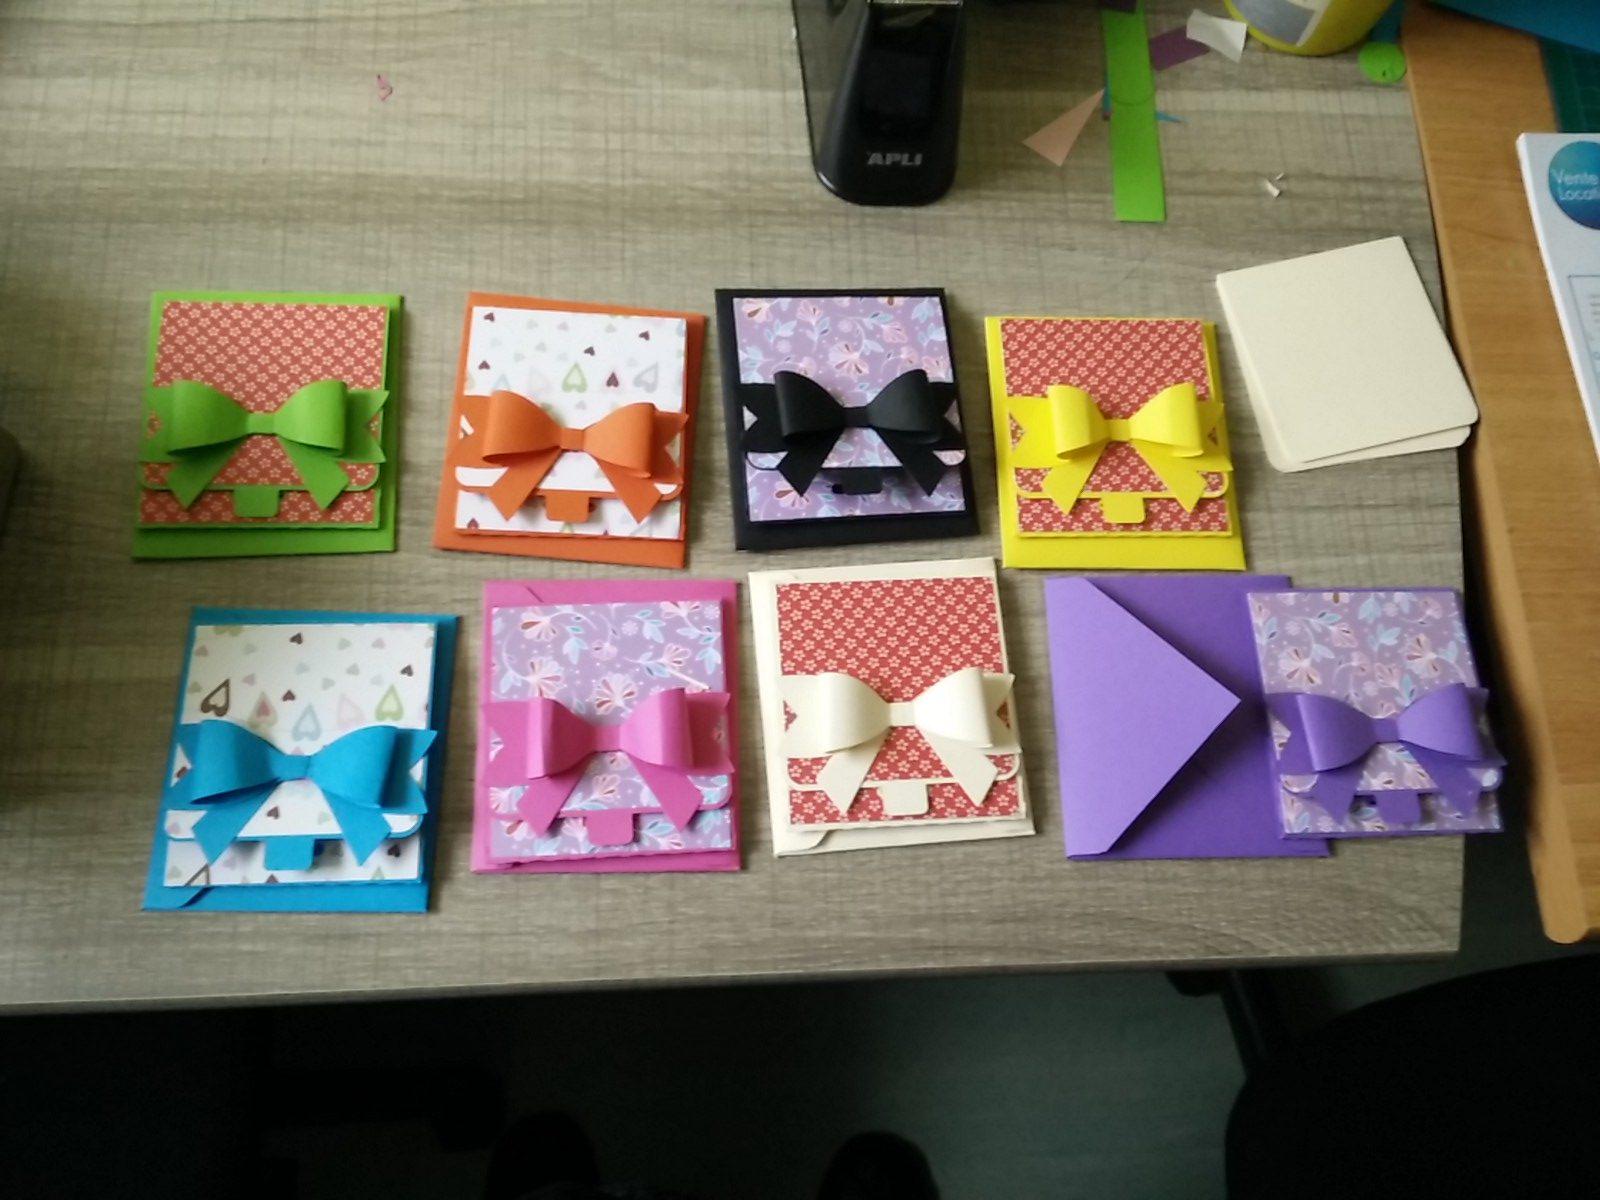 Carte invitation anniversaire ados filles - Anniversaire ado fille ...